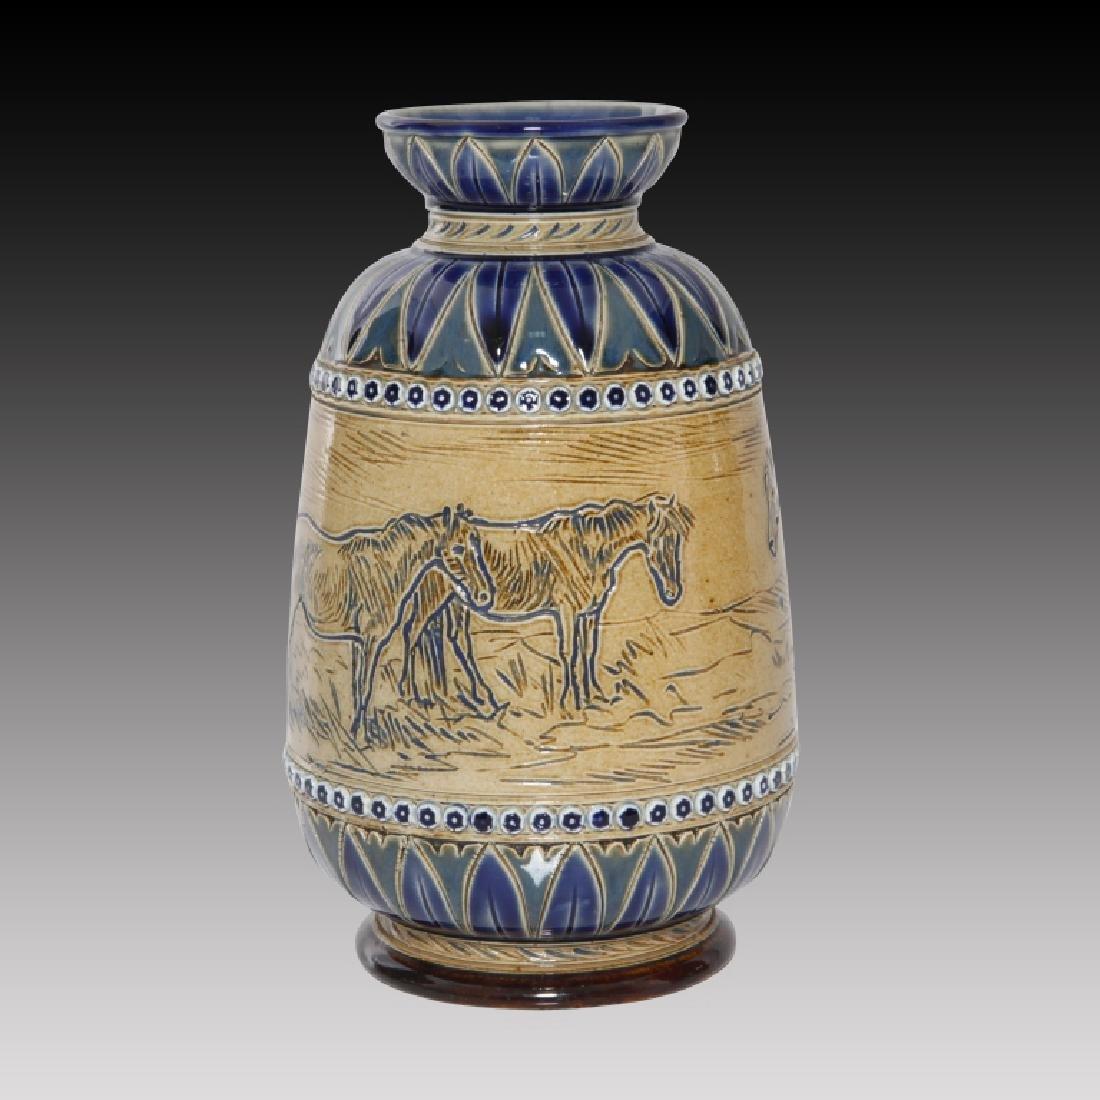 Doulton Lambeth Hannah Barlow Vase with Horses